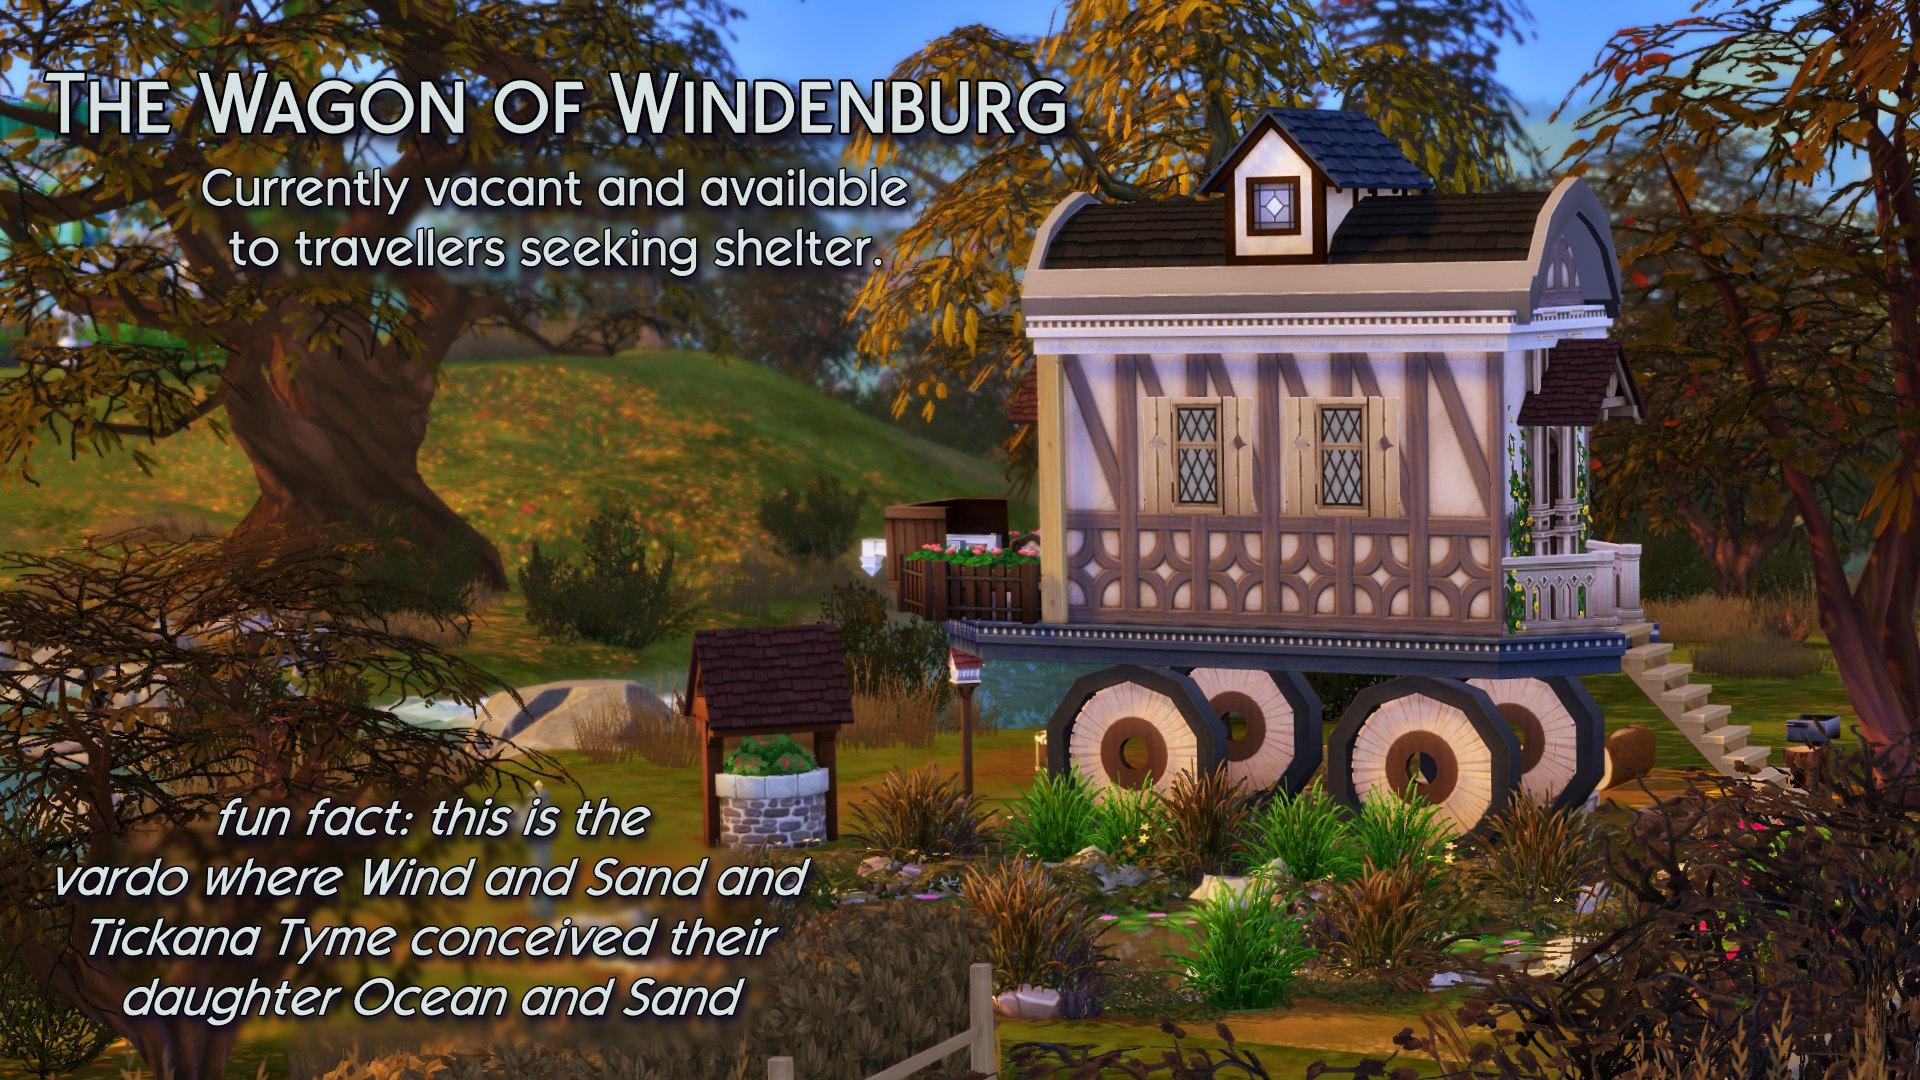 4 The Wagon of Windenburg